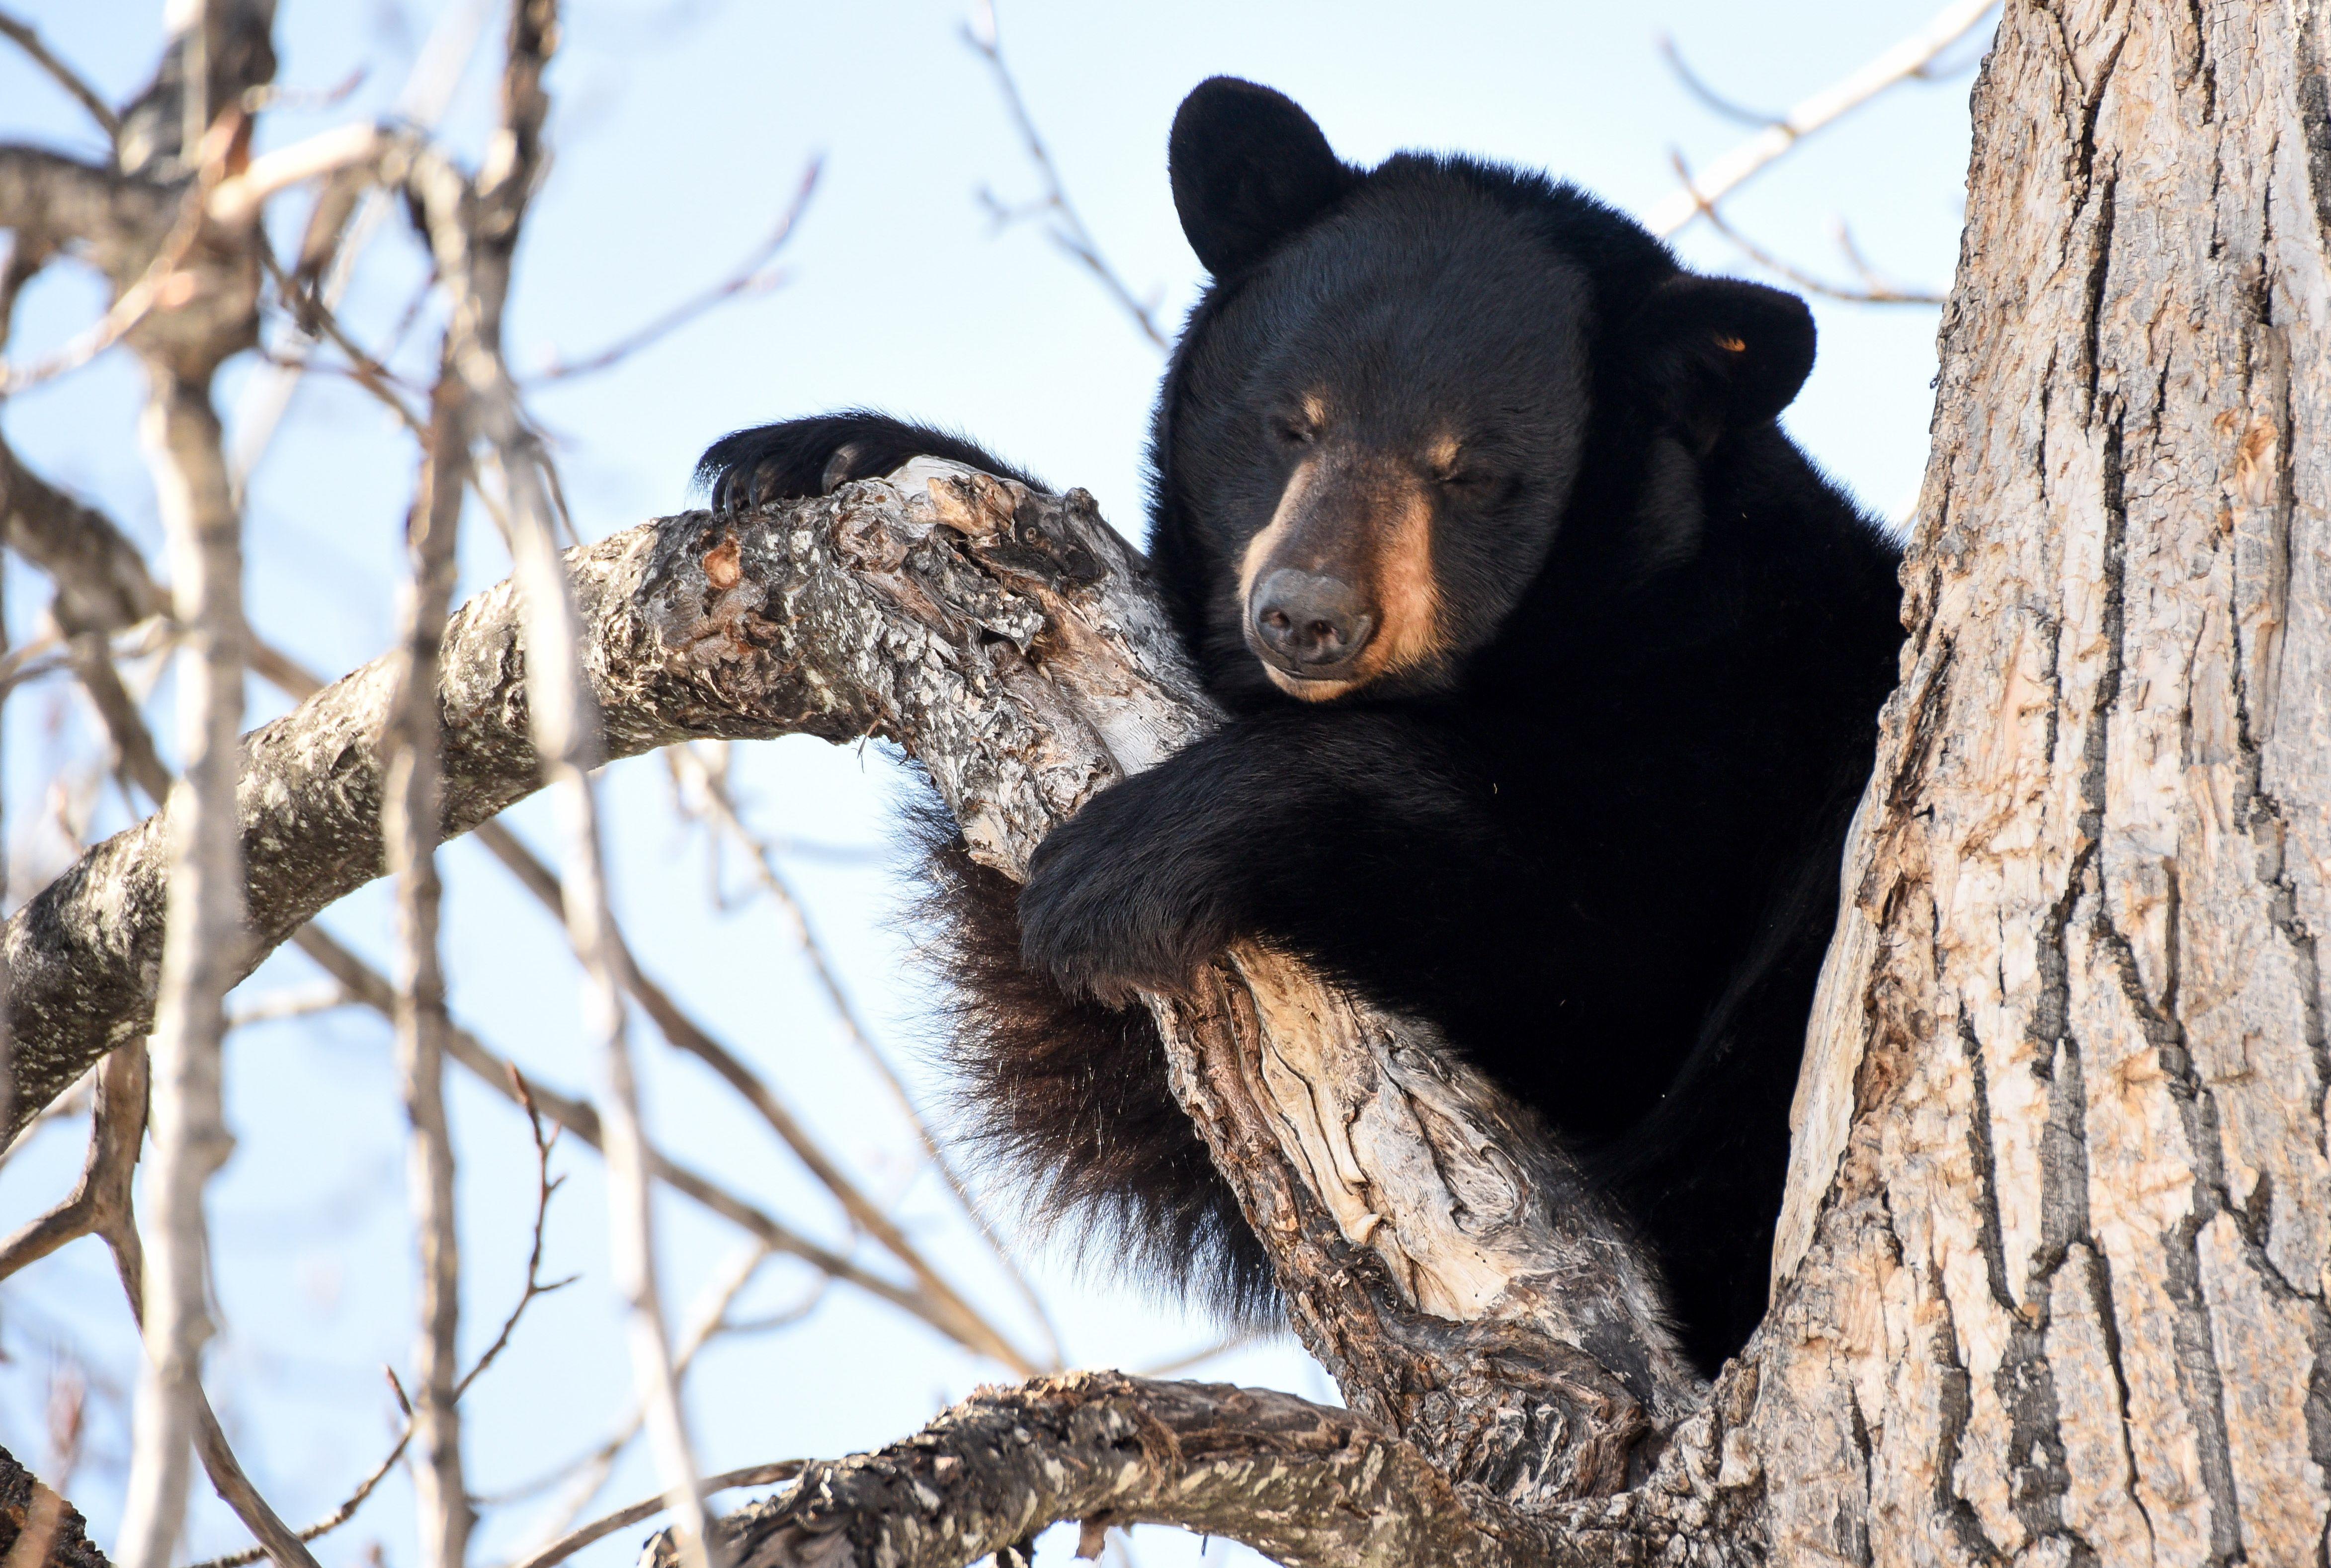 Glacier National Park Cameras Capture a Black Bear Waking Up From Hibernation | Mental Floss